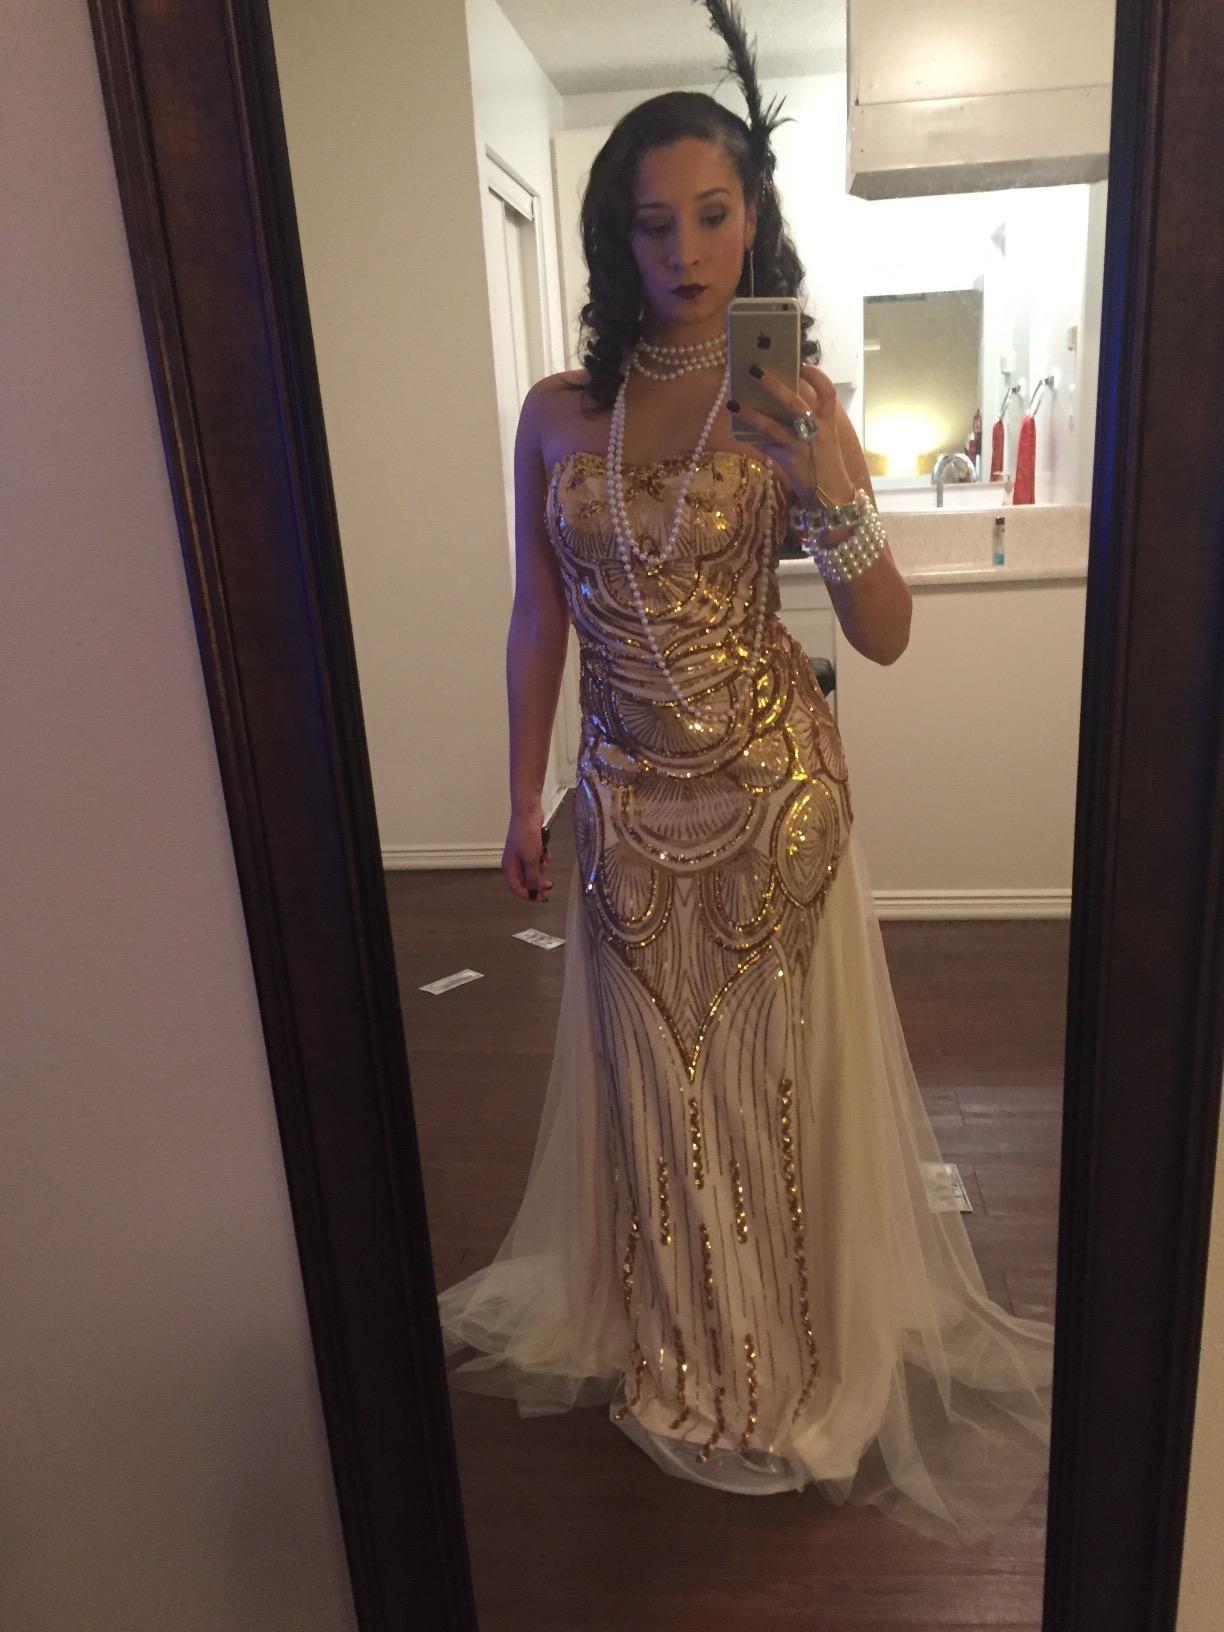 2ccbf8c20a8 Angel-fashions Women's Sequin Gold Mesh Lace up Banquet Dress | Amazon.com